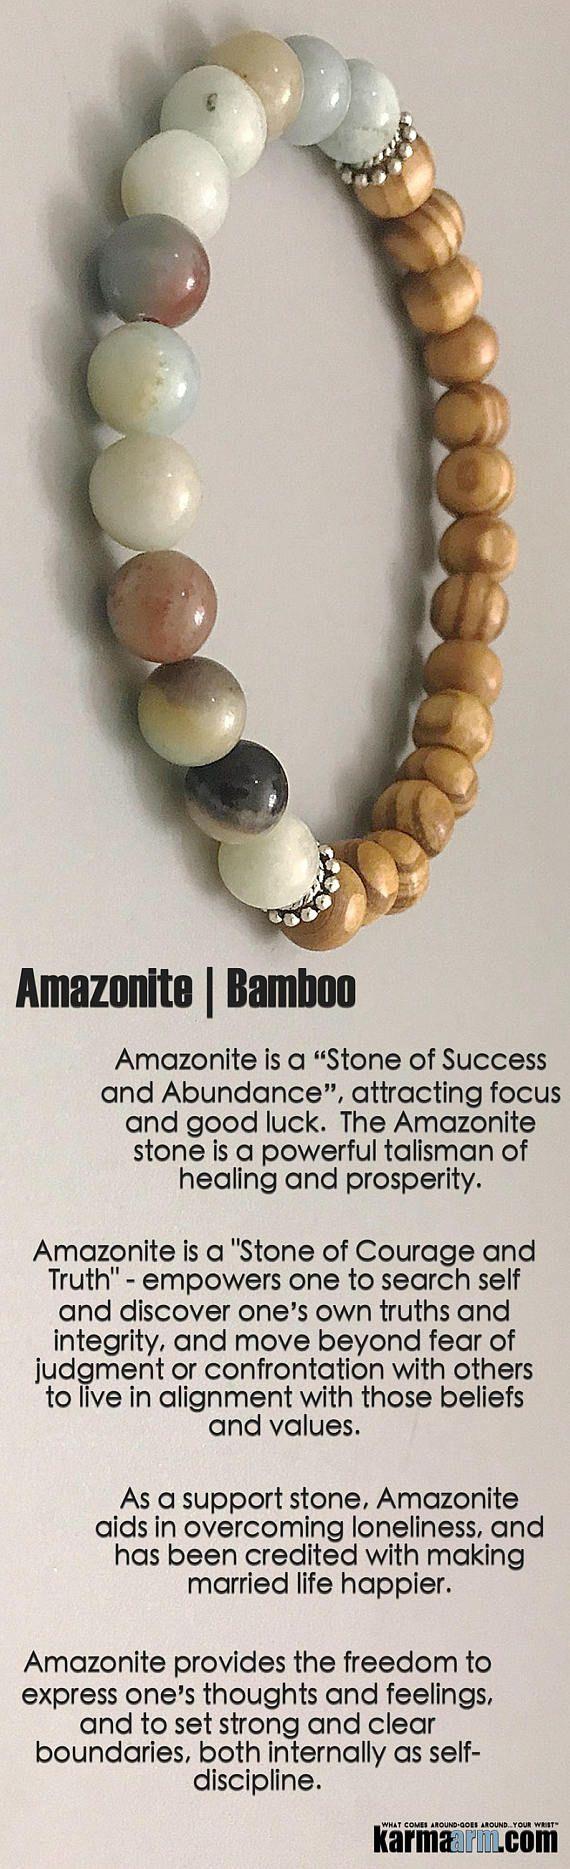 "#Amazonite is a ""Stone of #Success and #Abundance"", attracting #focus and good luck.    #Beaded #Beads #Bijoux #Bracelet #Bracelets #Buddhist #Chakra #Charm #Crystals #Energy #gifts #gratitude #Handmade #Healing #Jewelry #Kundalini #LawOfAttraction #LOA #Love #Mala #Meditation #Mens #prayer #pulseiras #Reiki #Spiritual #Stacks #Stretch #Womens #Yoga #YogaBracelets #fertility"